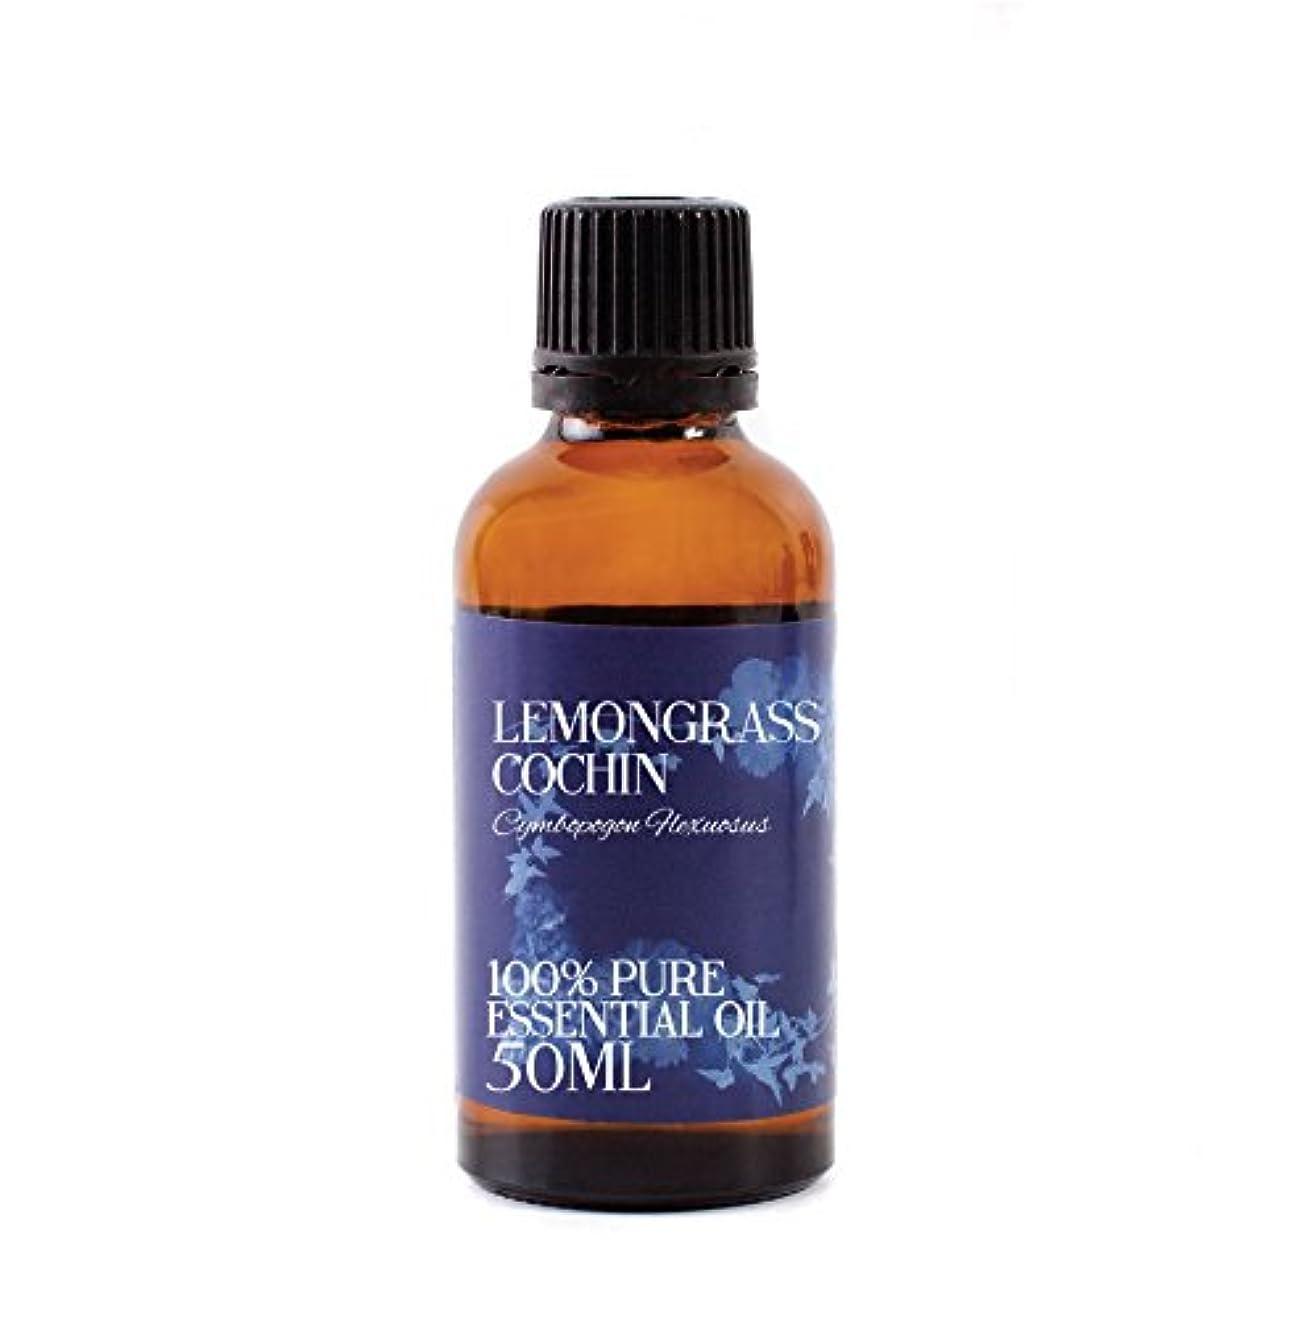 Mystic Moments | Lemongrass Cochin Essential Oil - 50ml - 100% Pure